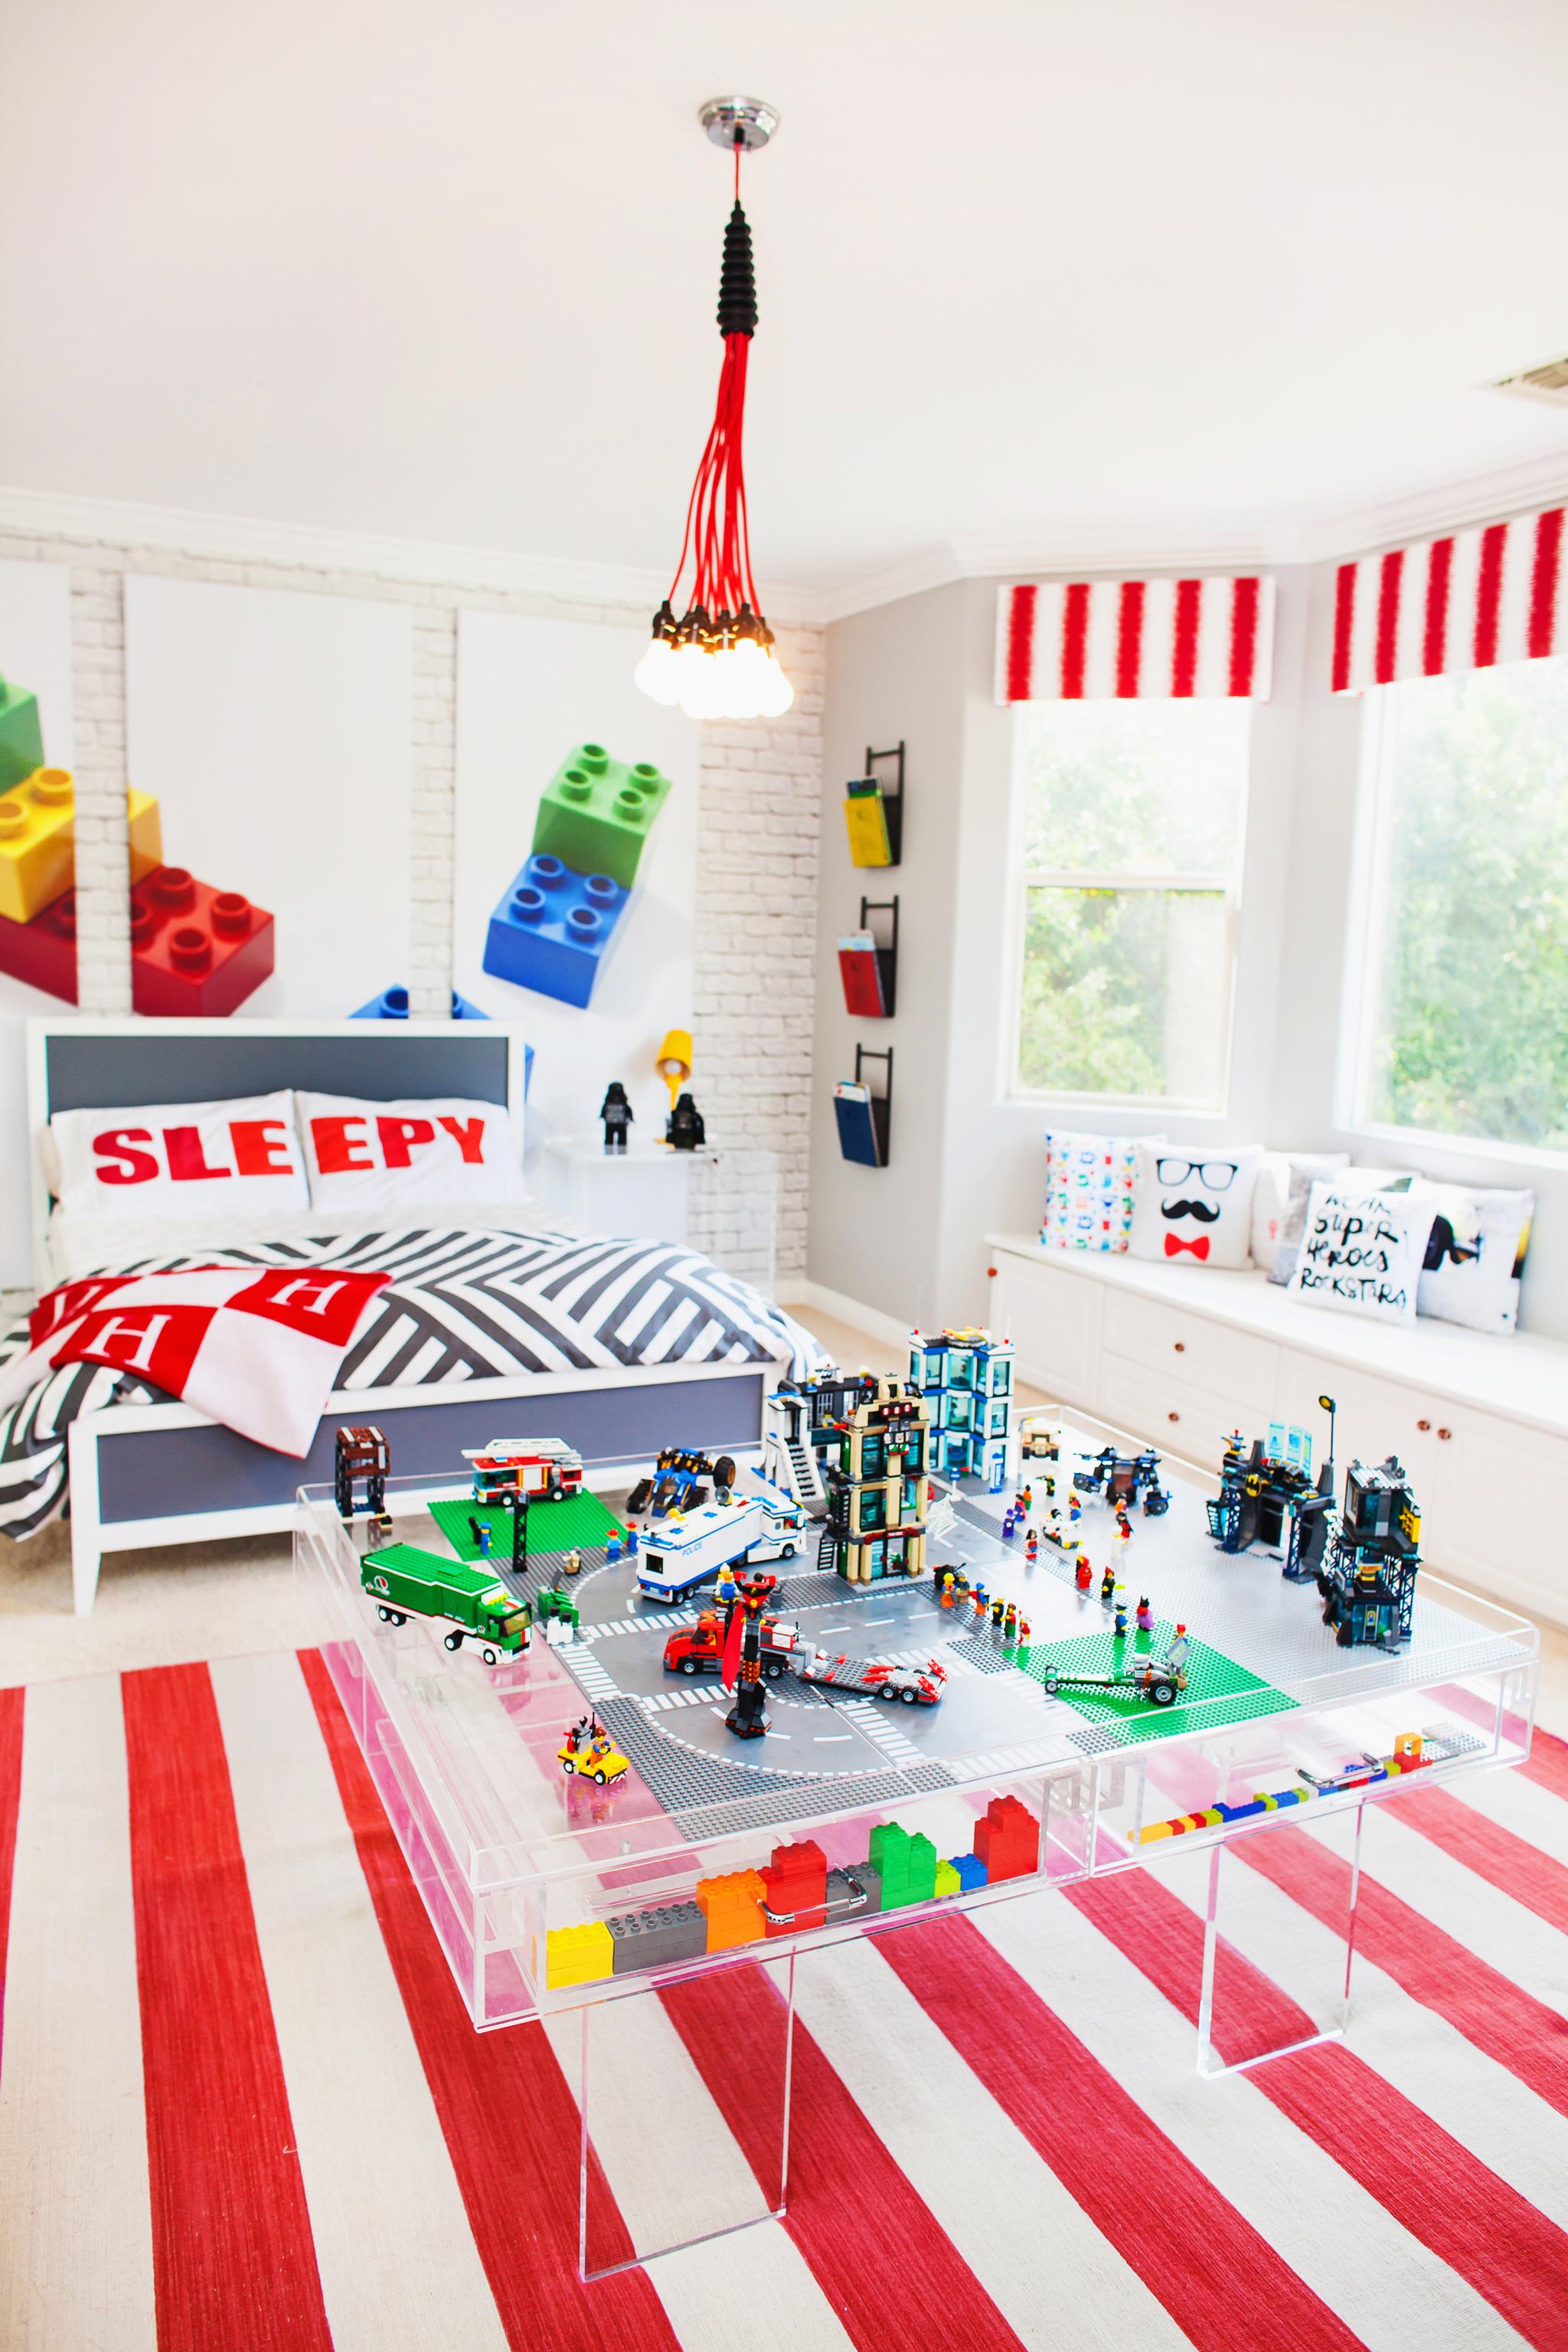 Kendra Wilkinson's Son's Lego Room